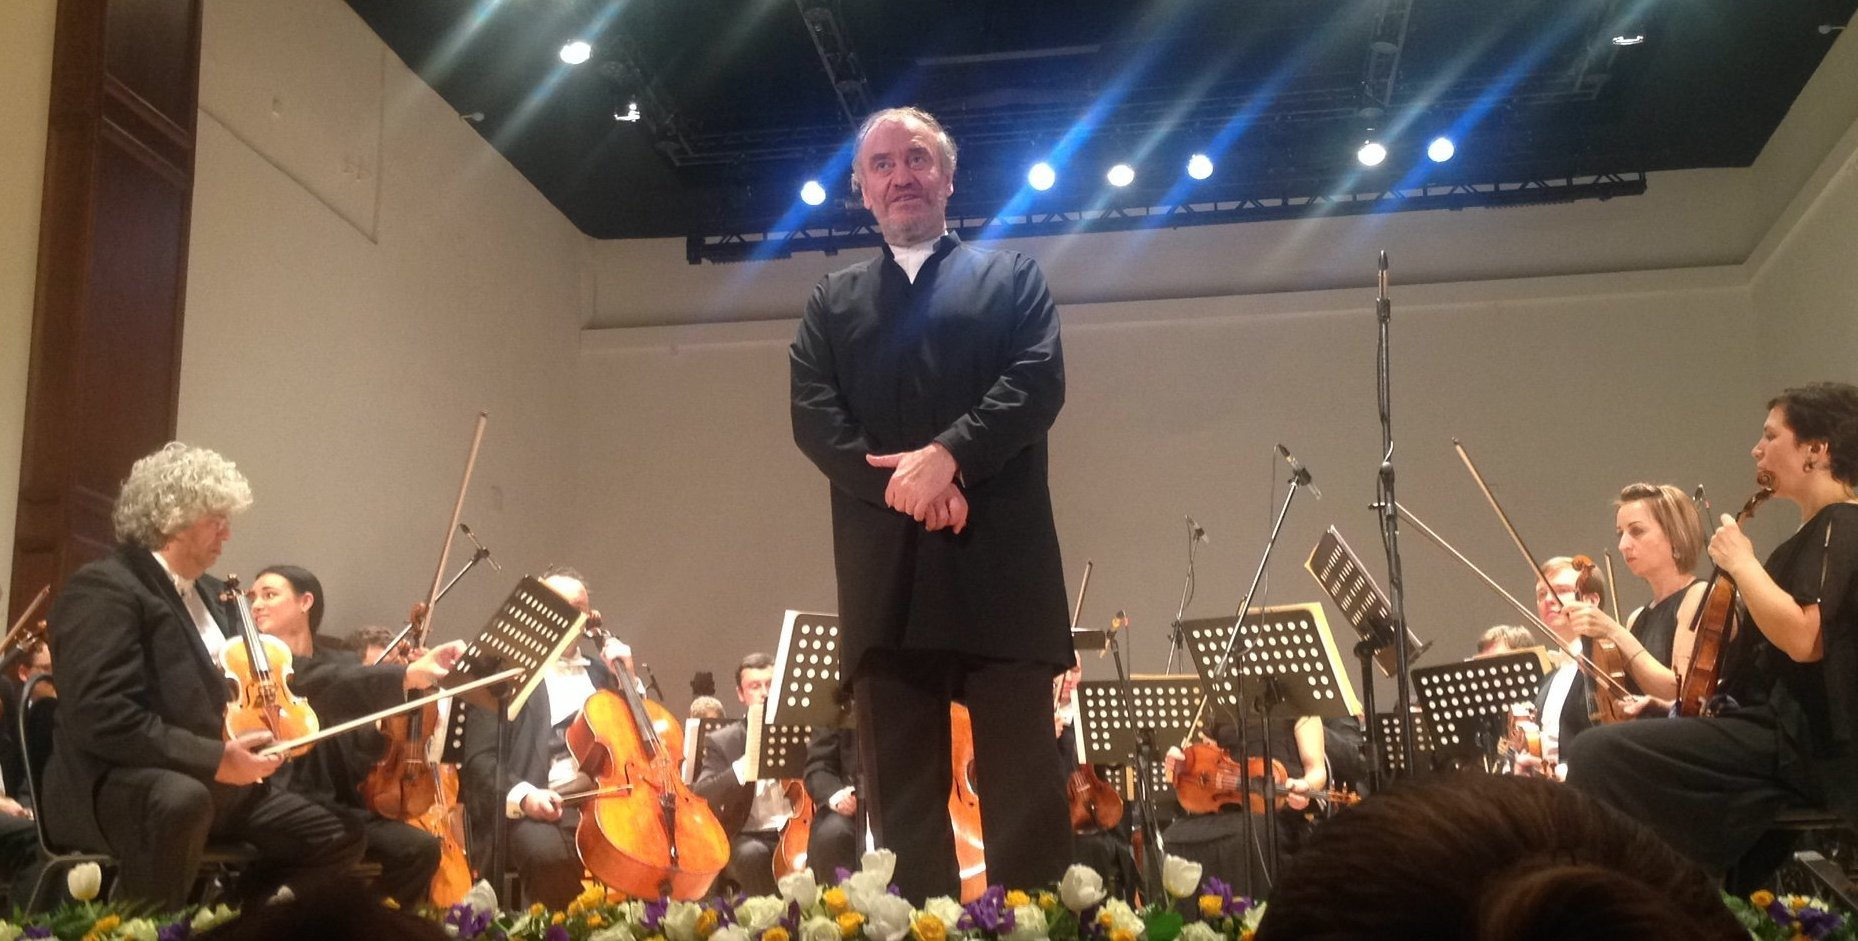 Валерий Гергиев на концерте в госфлармонии Владикавказа